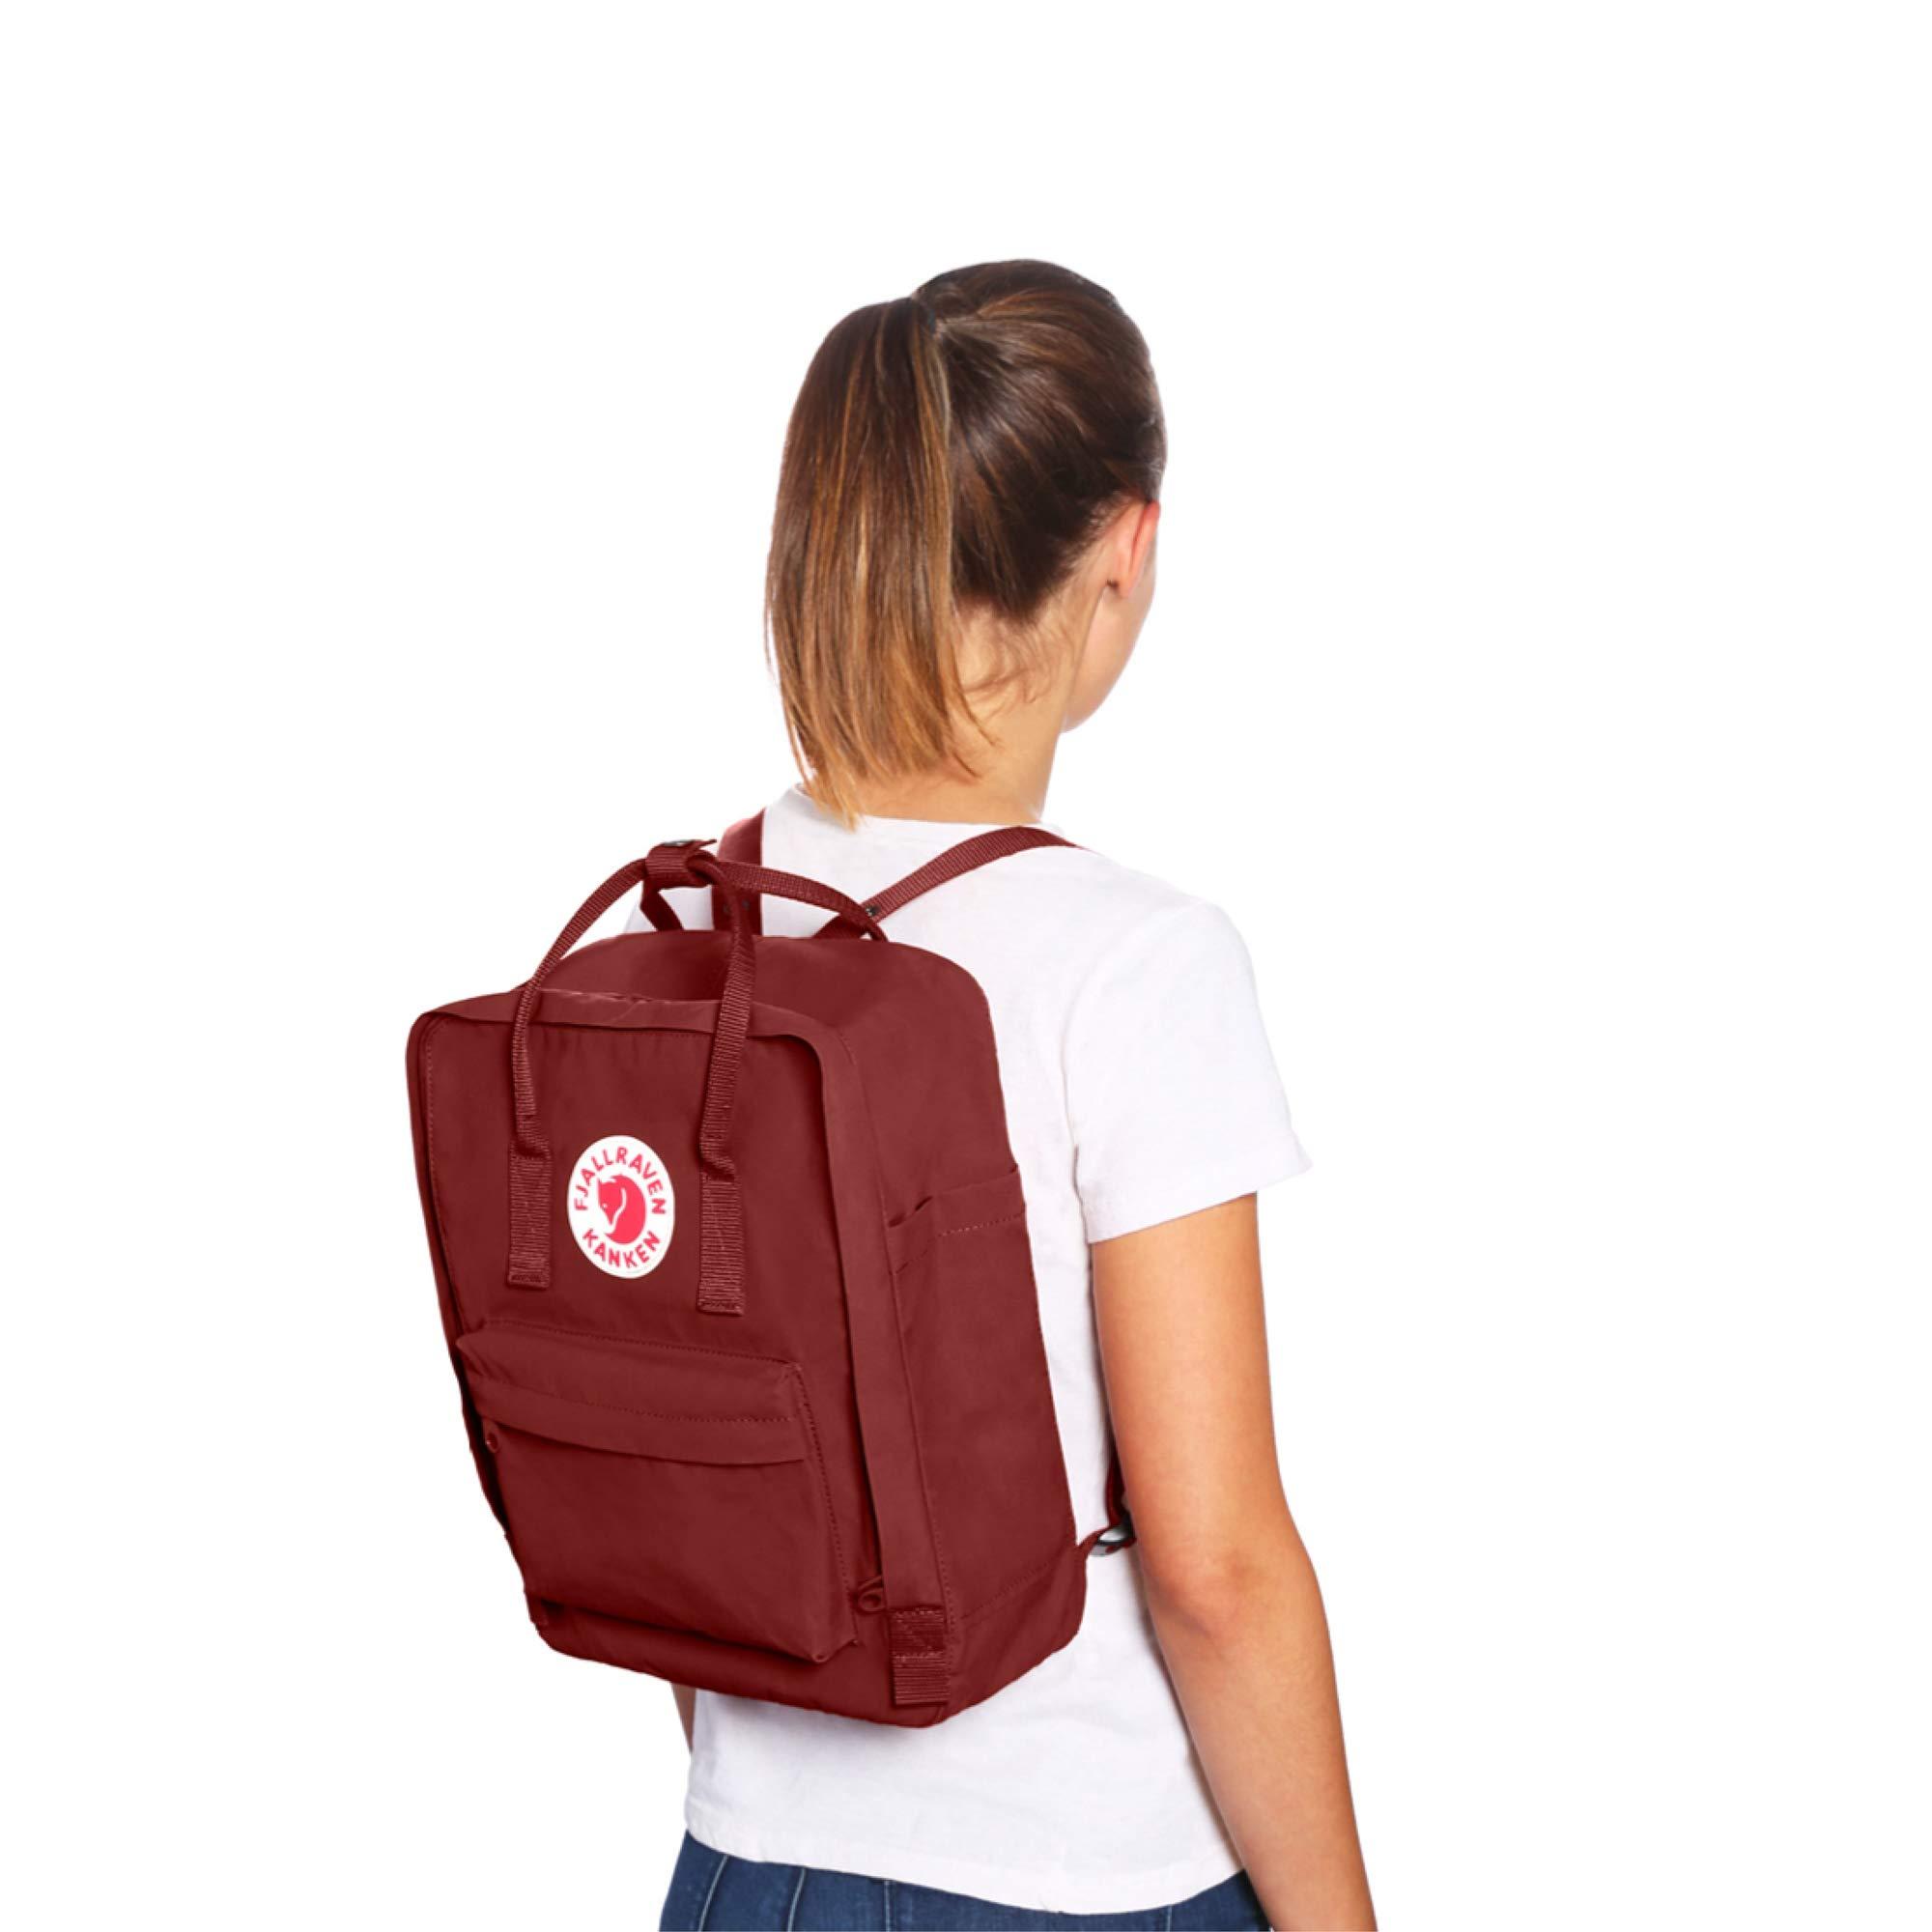 Fjallraven - Kanken Classic Backpack for Everyday, Dahlia by Fjallraven (Image #6)